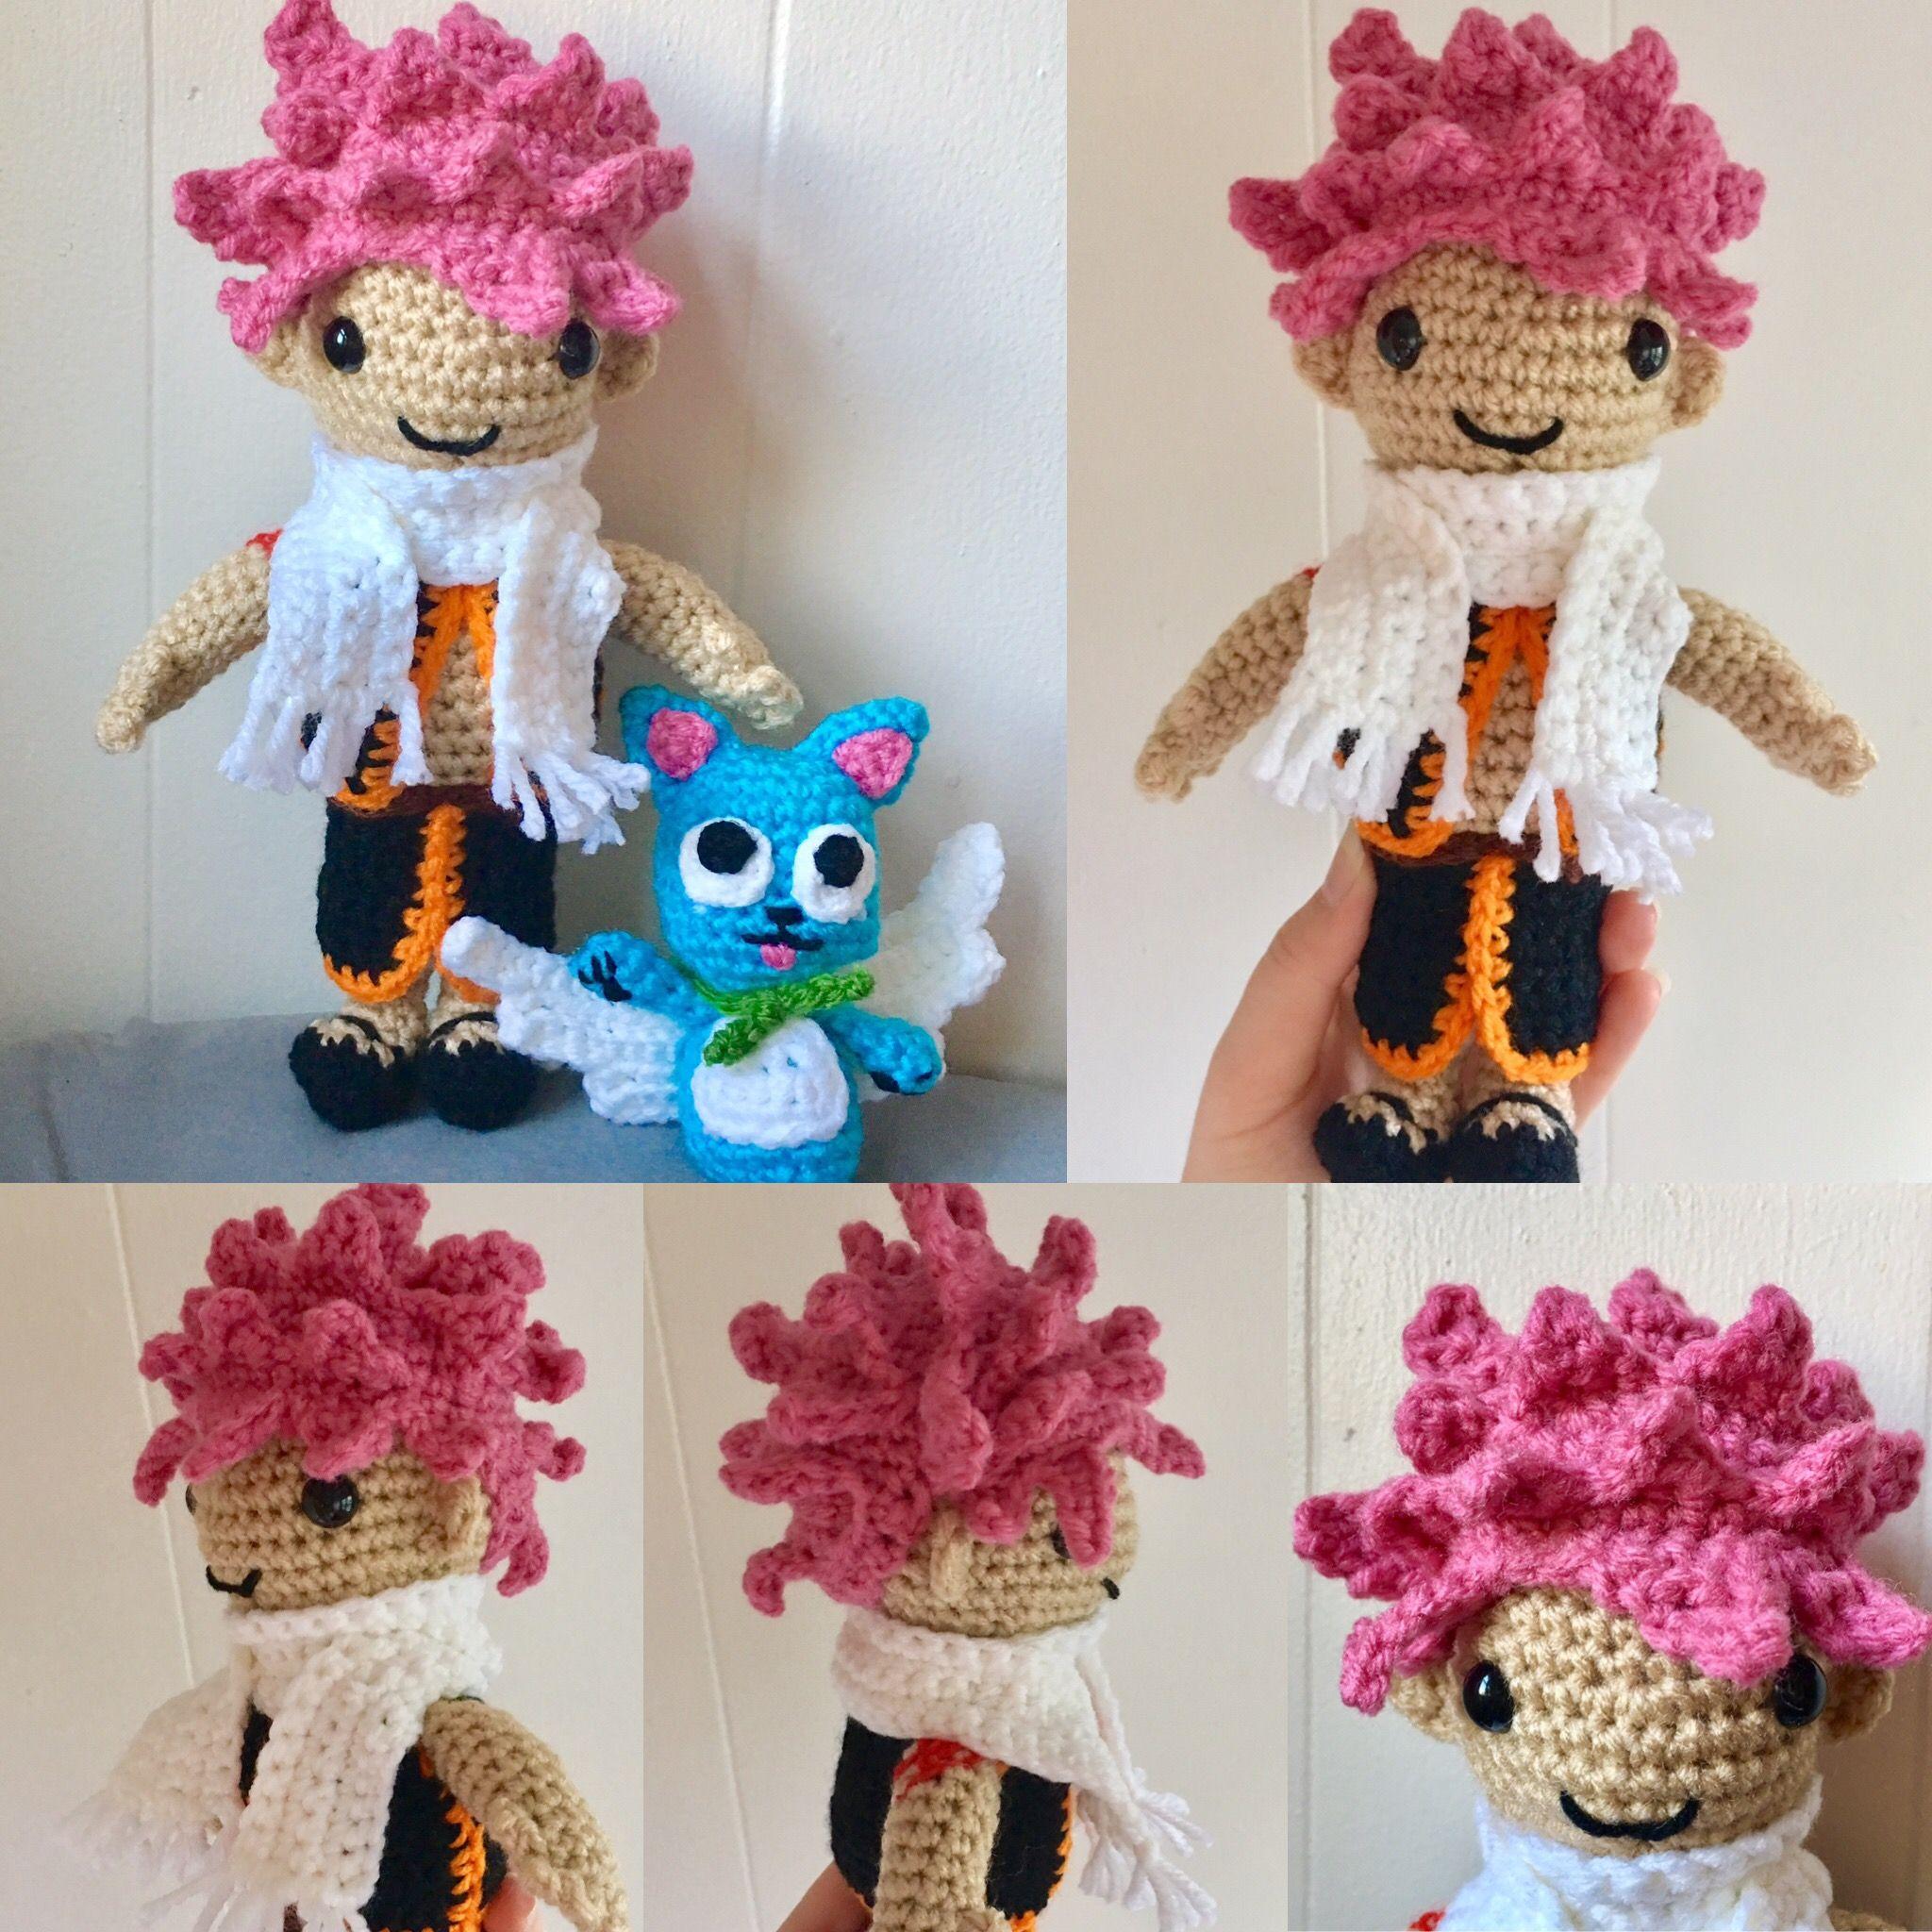 Crochet Lion Amigurumi Pattern - Free - Ami Amour | 2048x2048